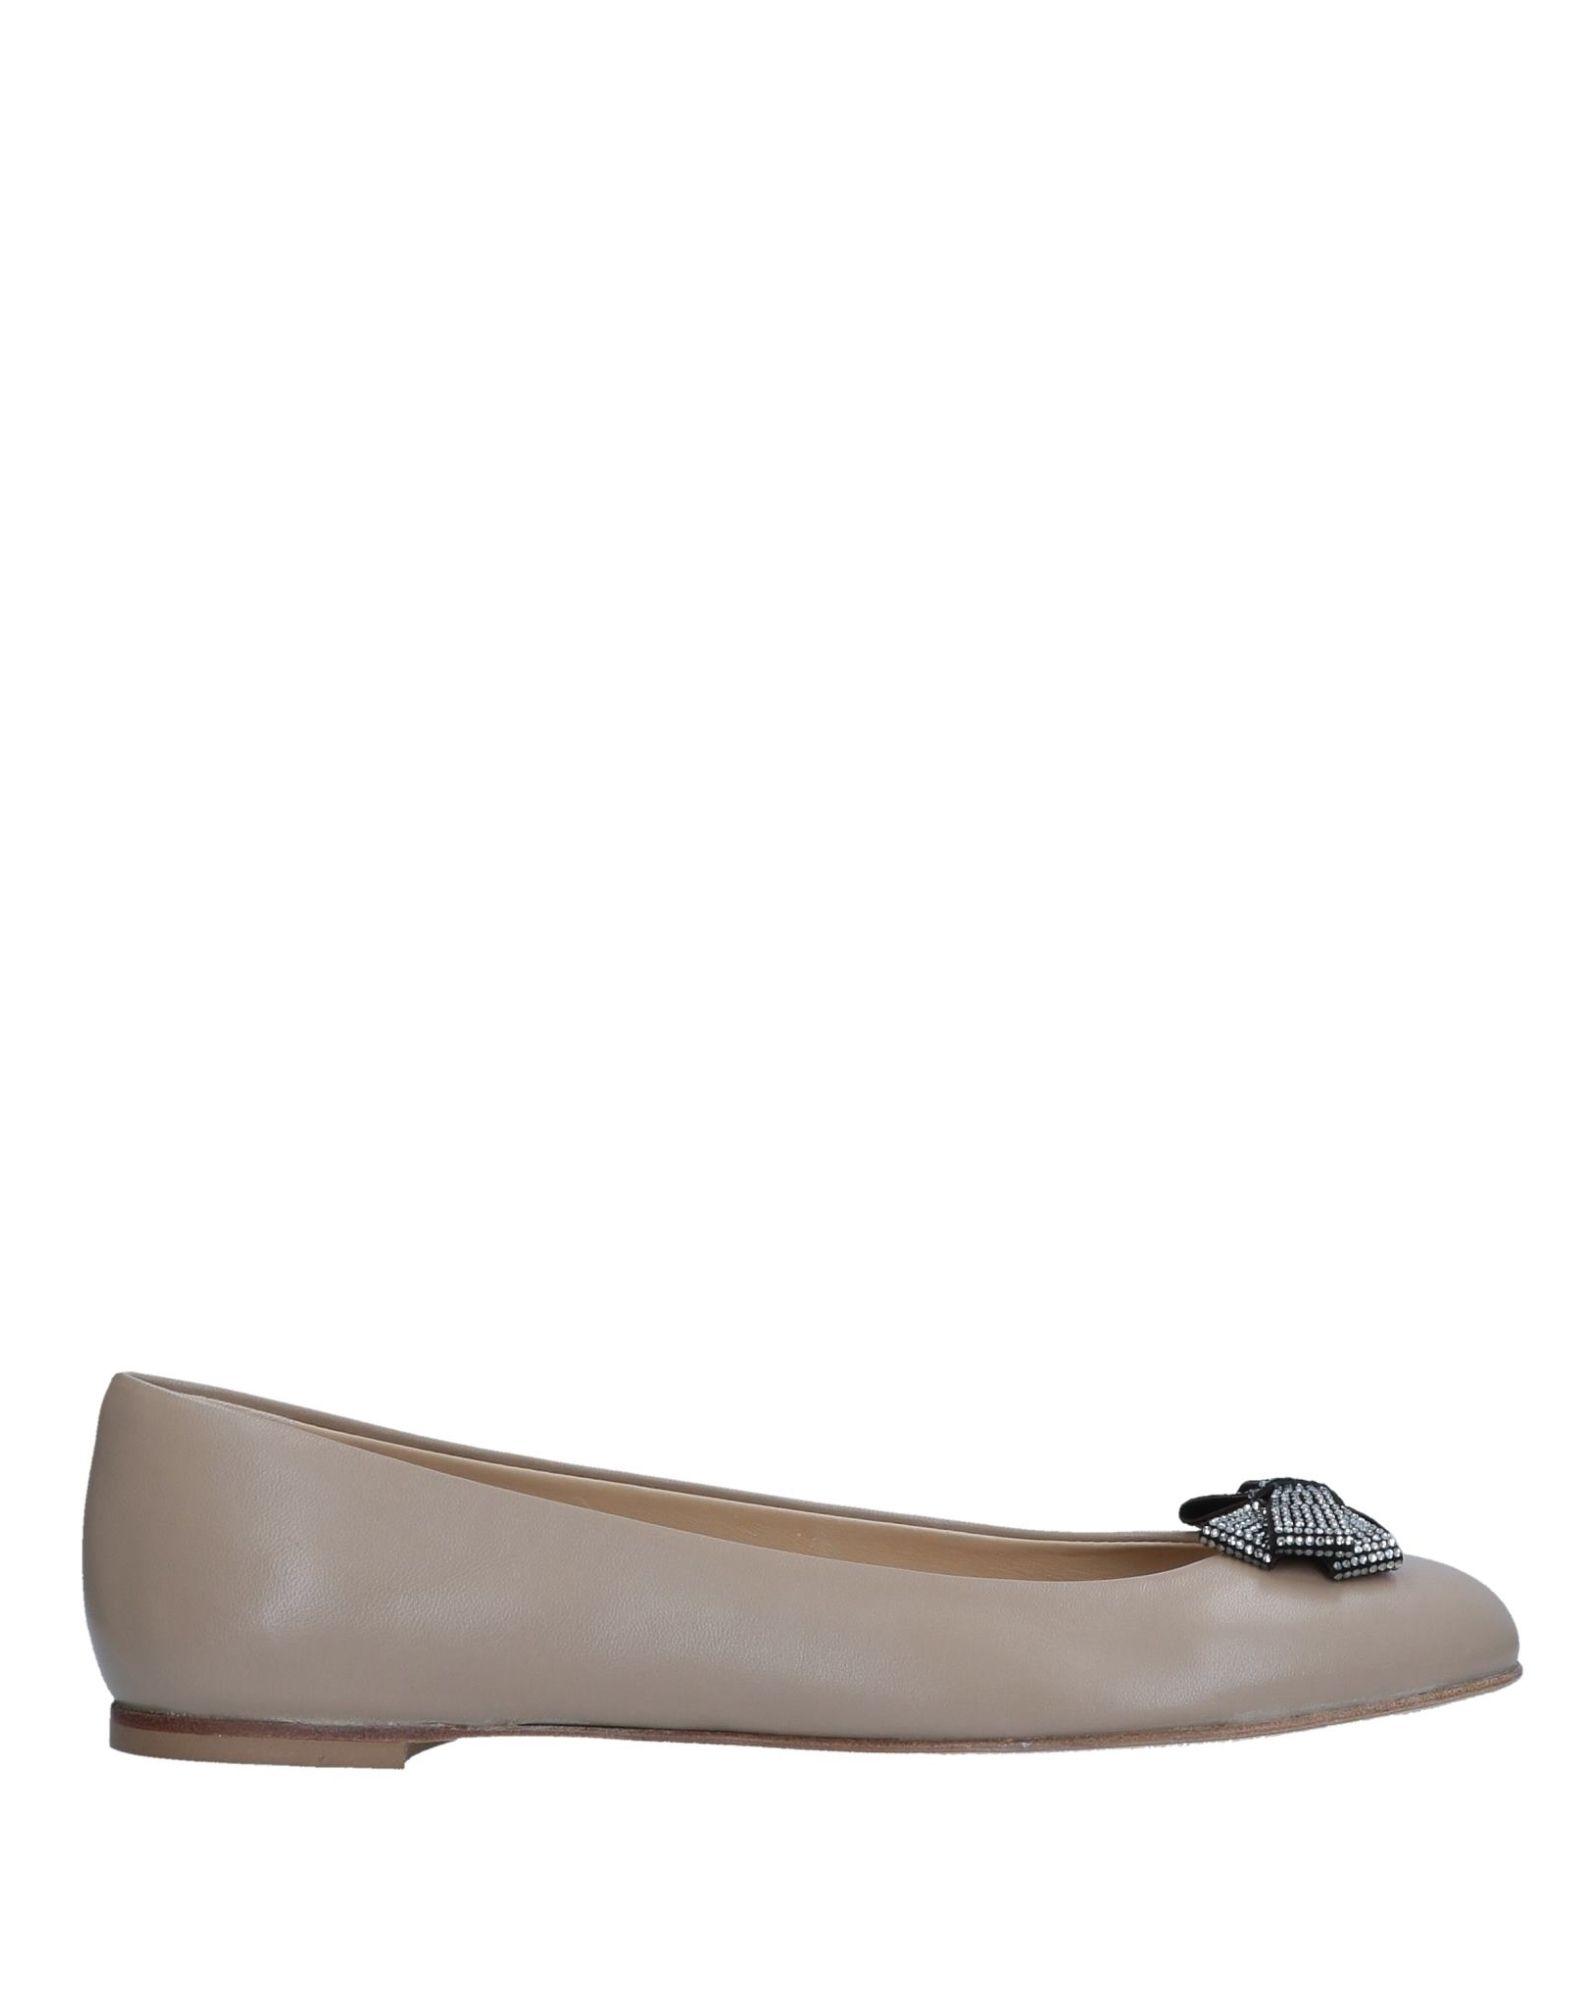 Rabatt Schuhe Giuseppe Zanotti Ballerinas 11547097MS Damen  11547097MS Ballerinas 709d6d